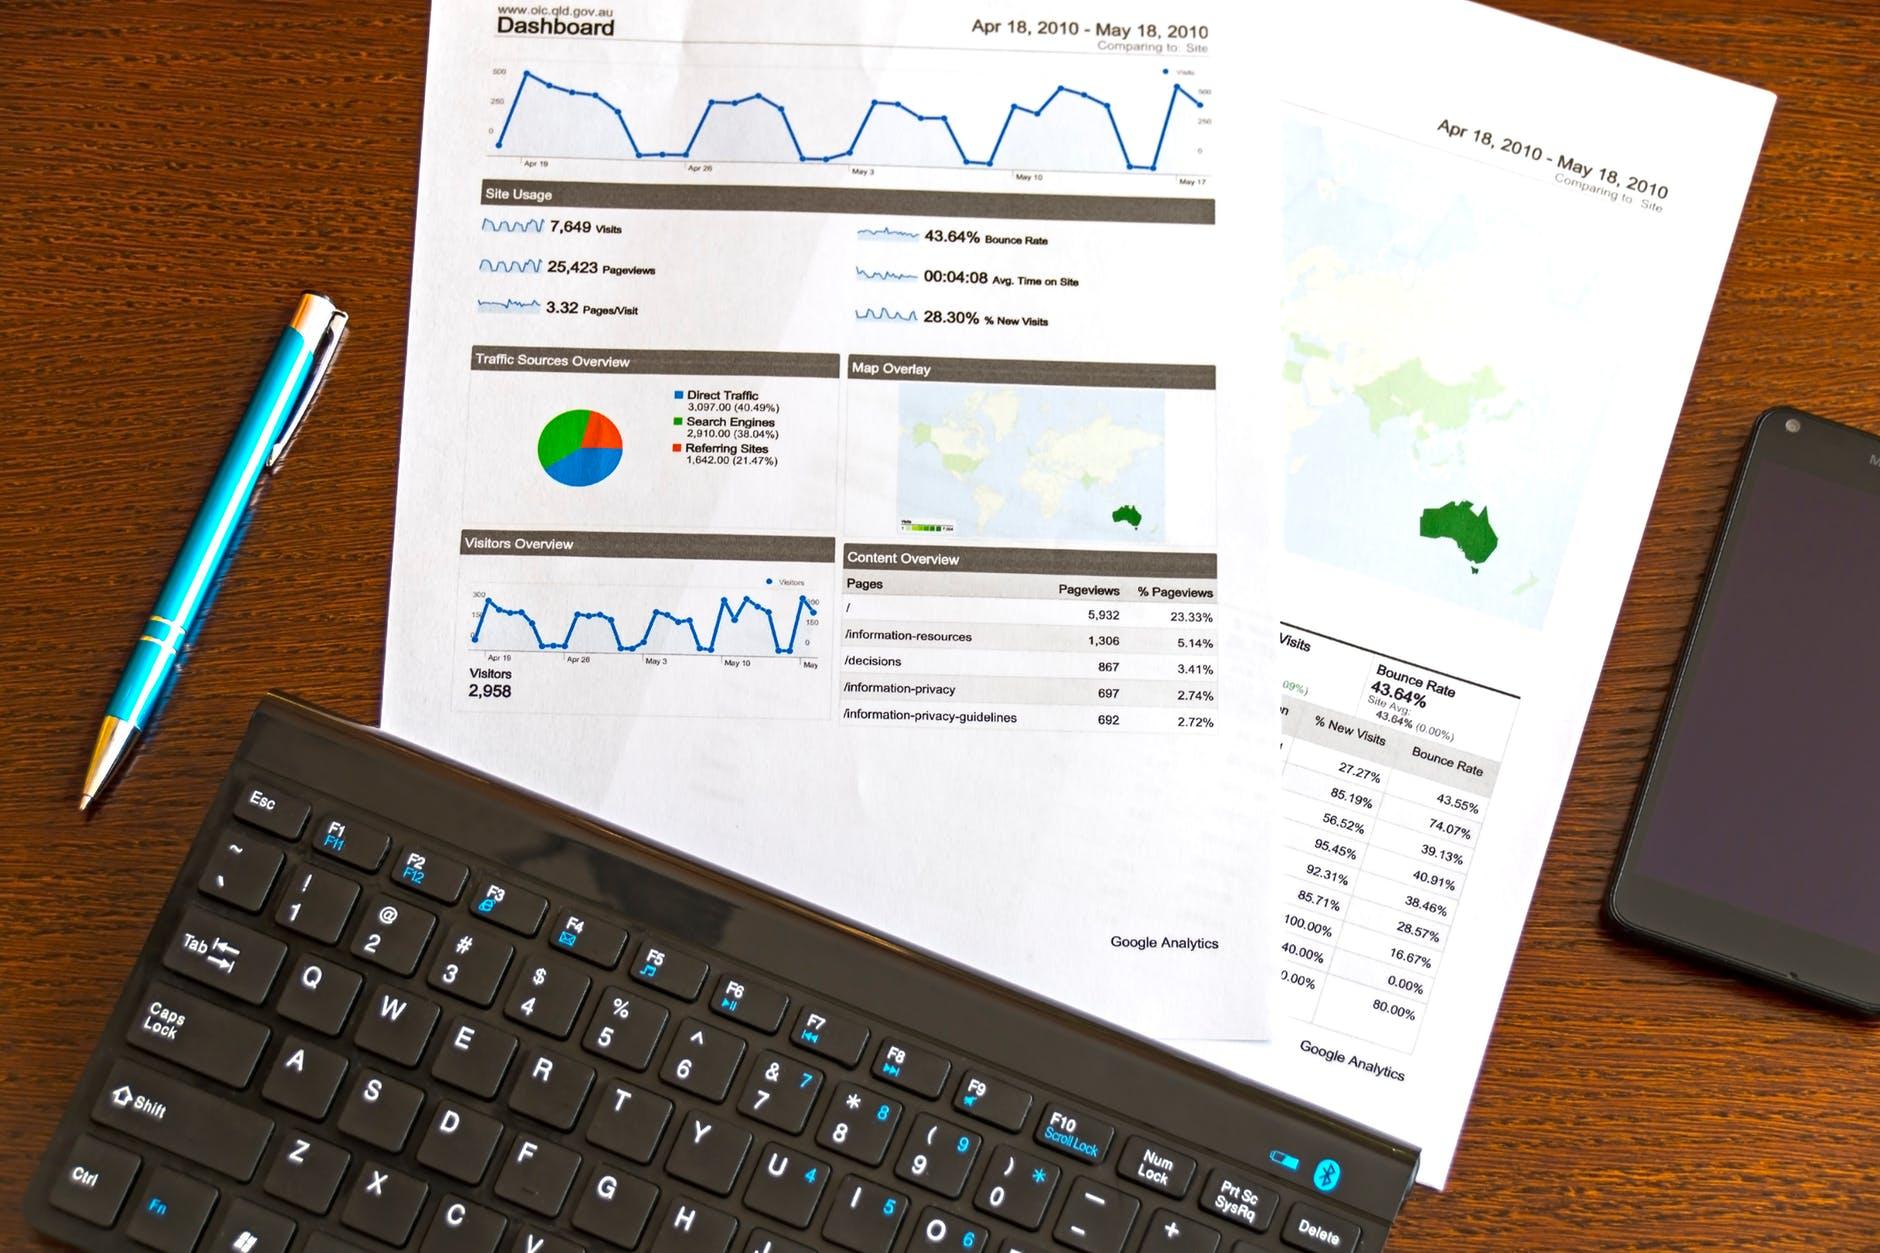 Mad Marketing, Marketing consultation, Marketing cost analysis, Strategic Marketing, Online marketing